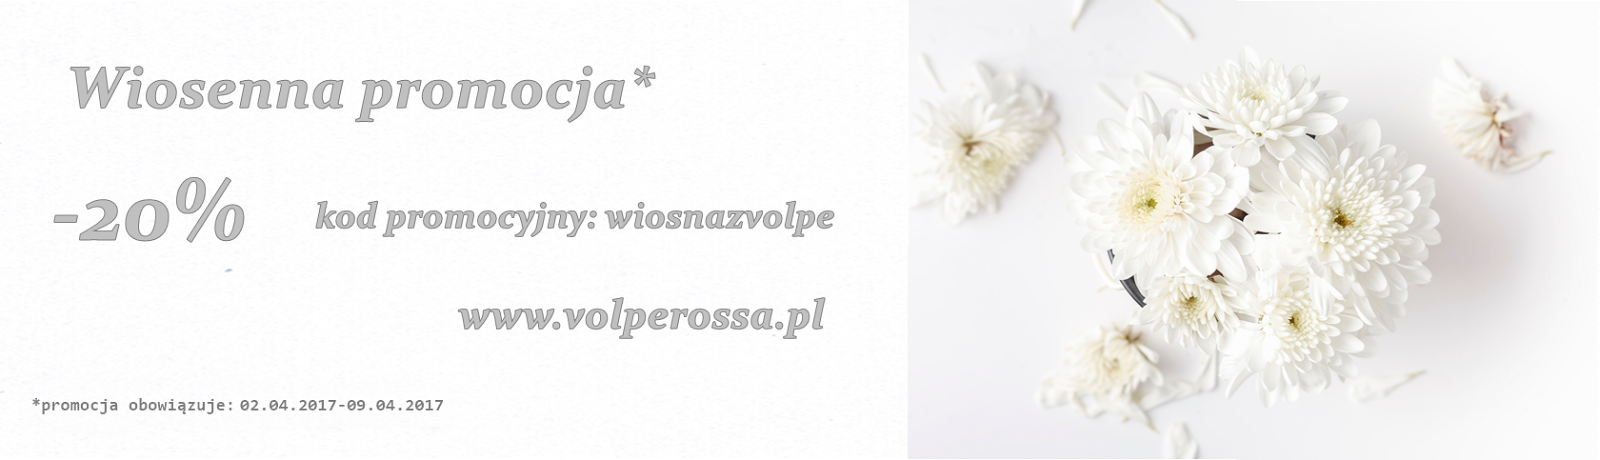 http://www.volperossa.pl/